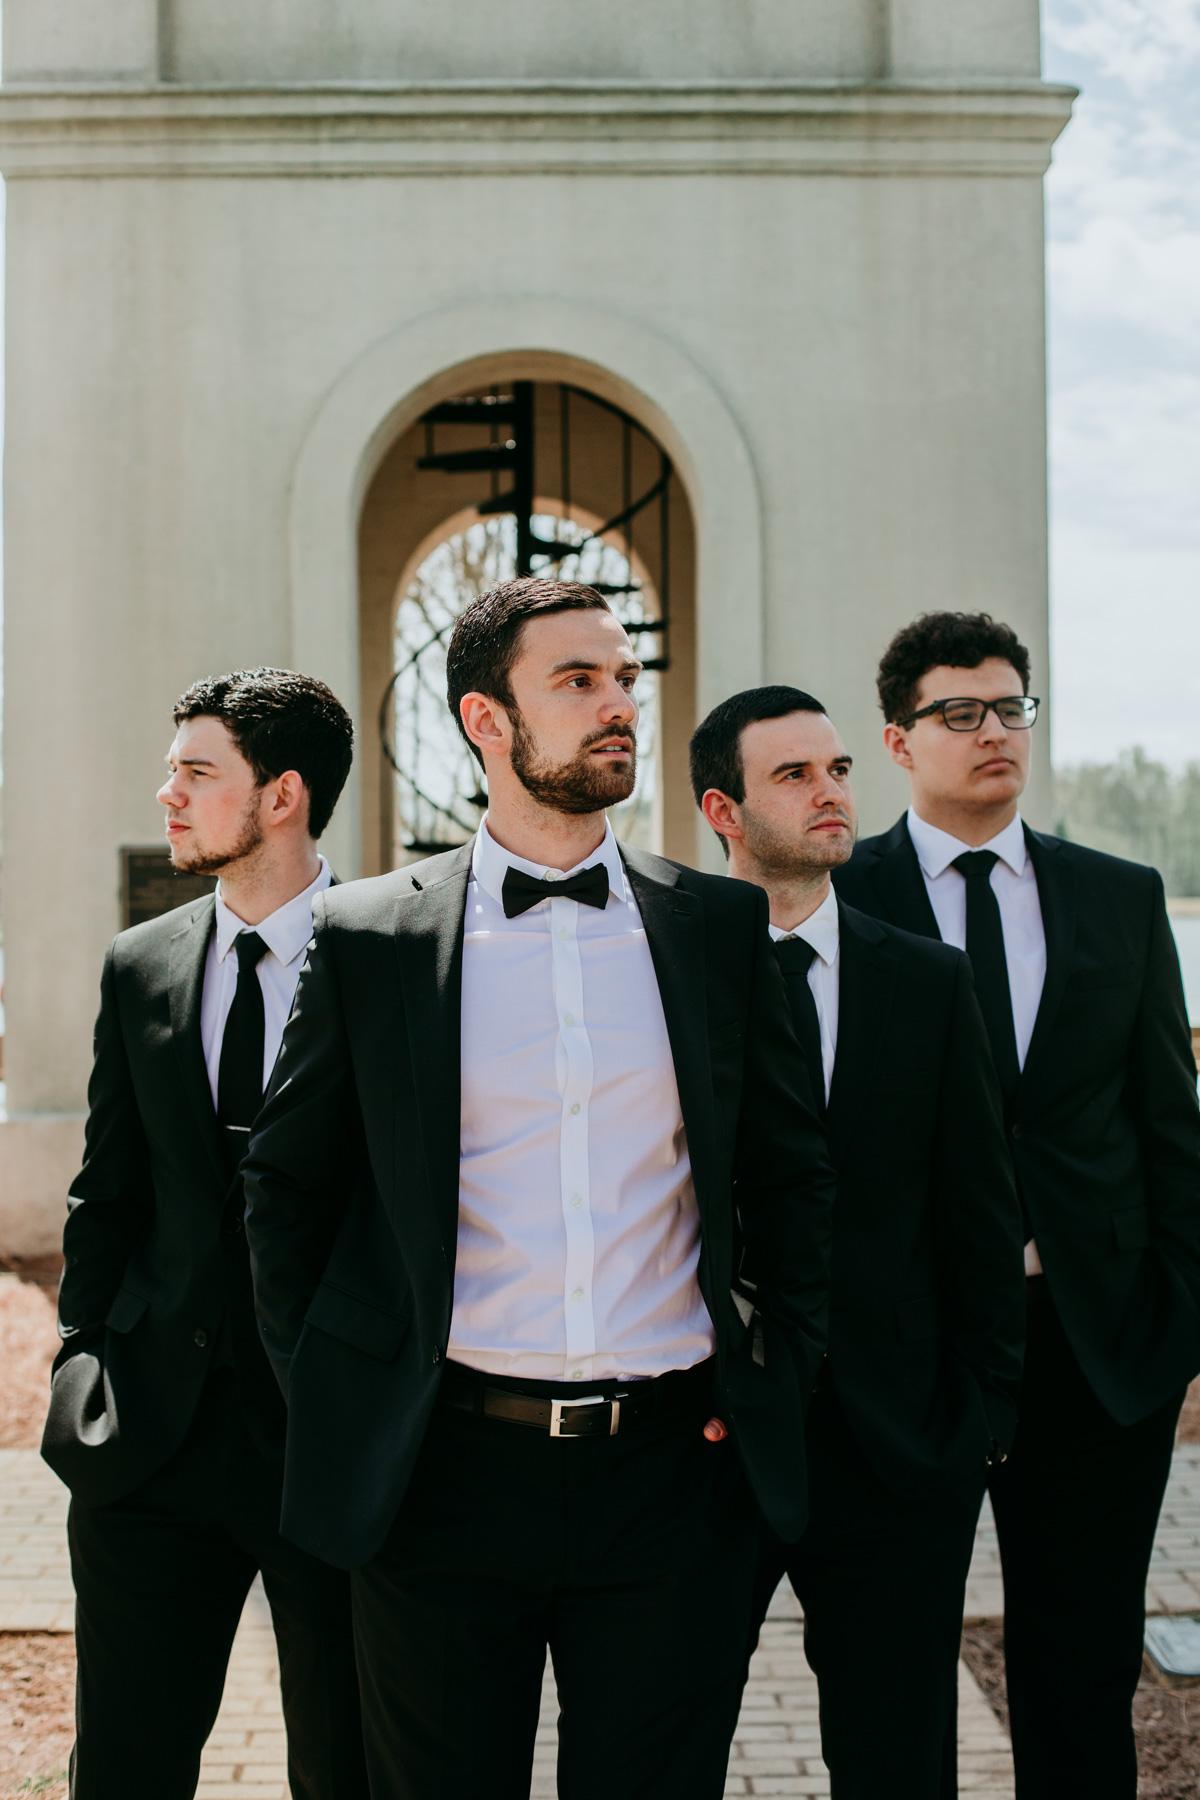 unique-groom-photos.jpg